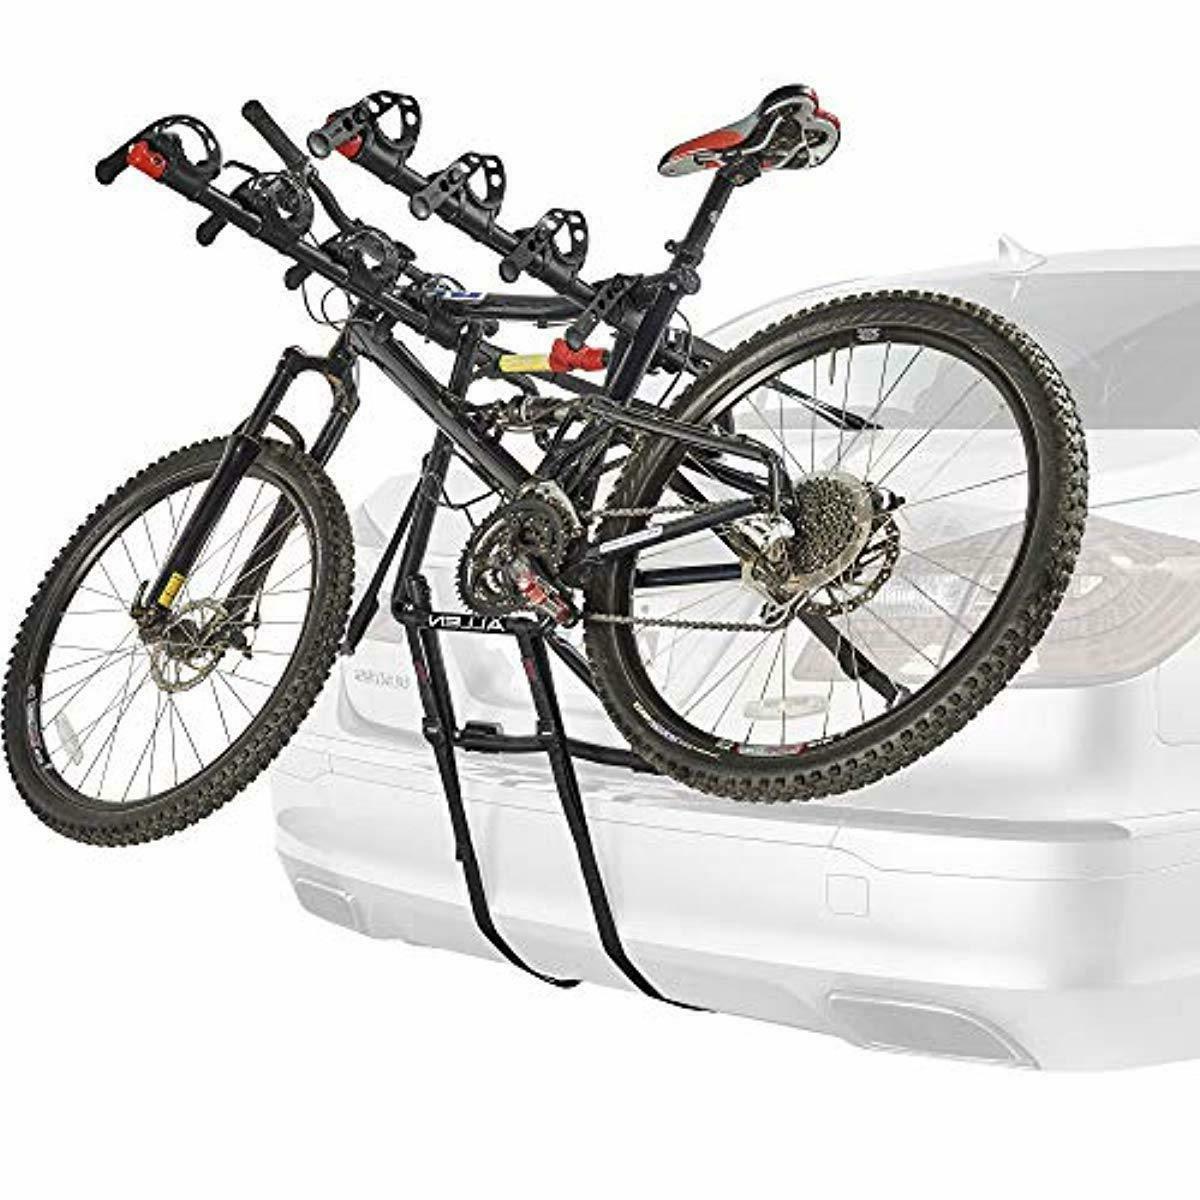 Mounted Bike Rack